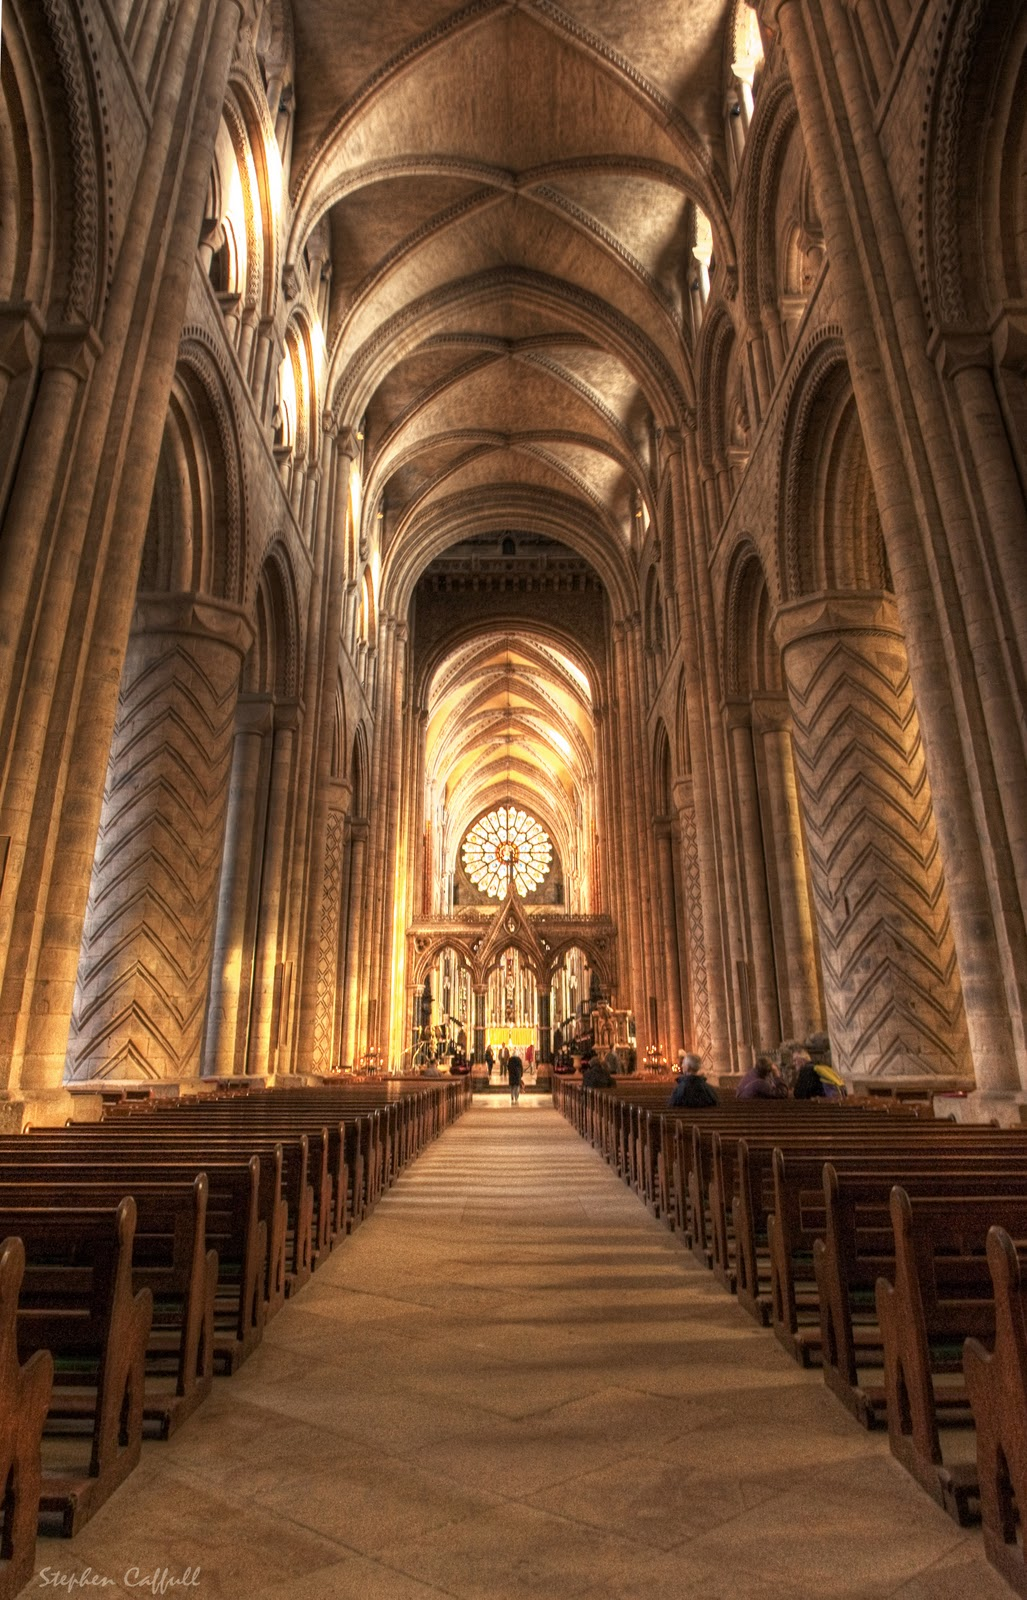 a m me da miedo la catedral de durham